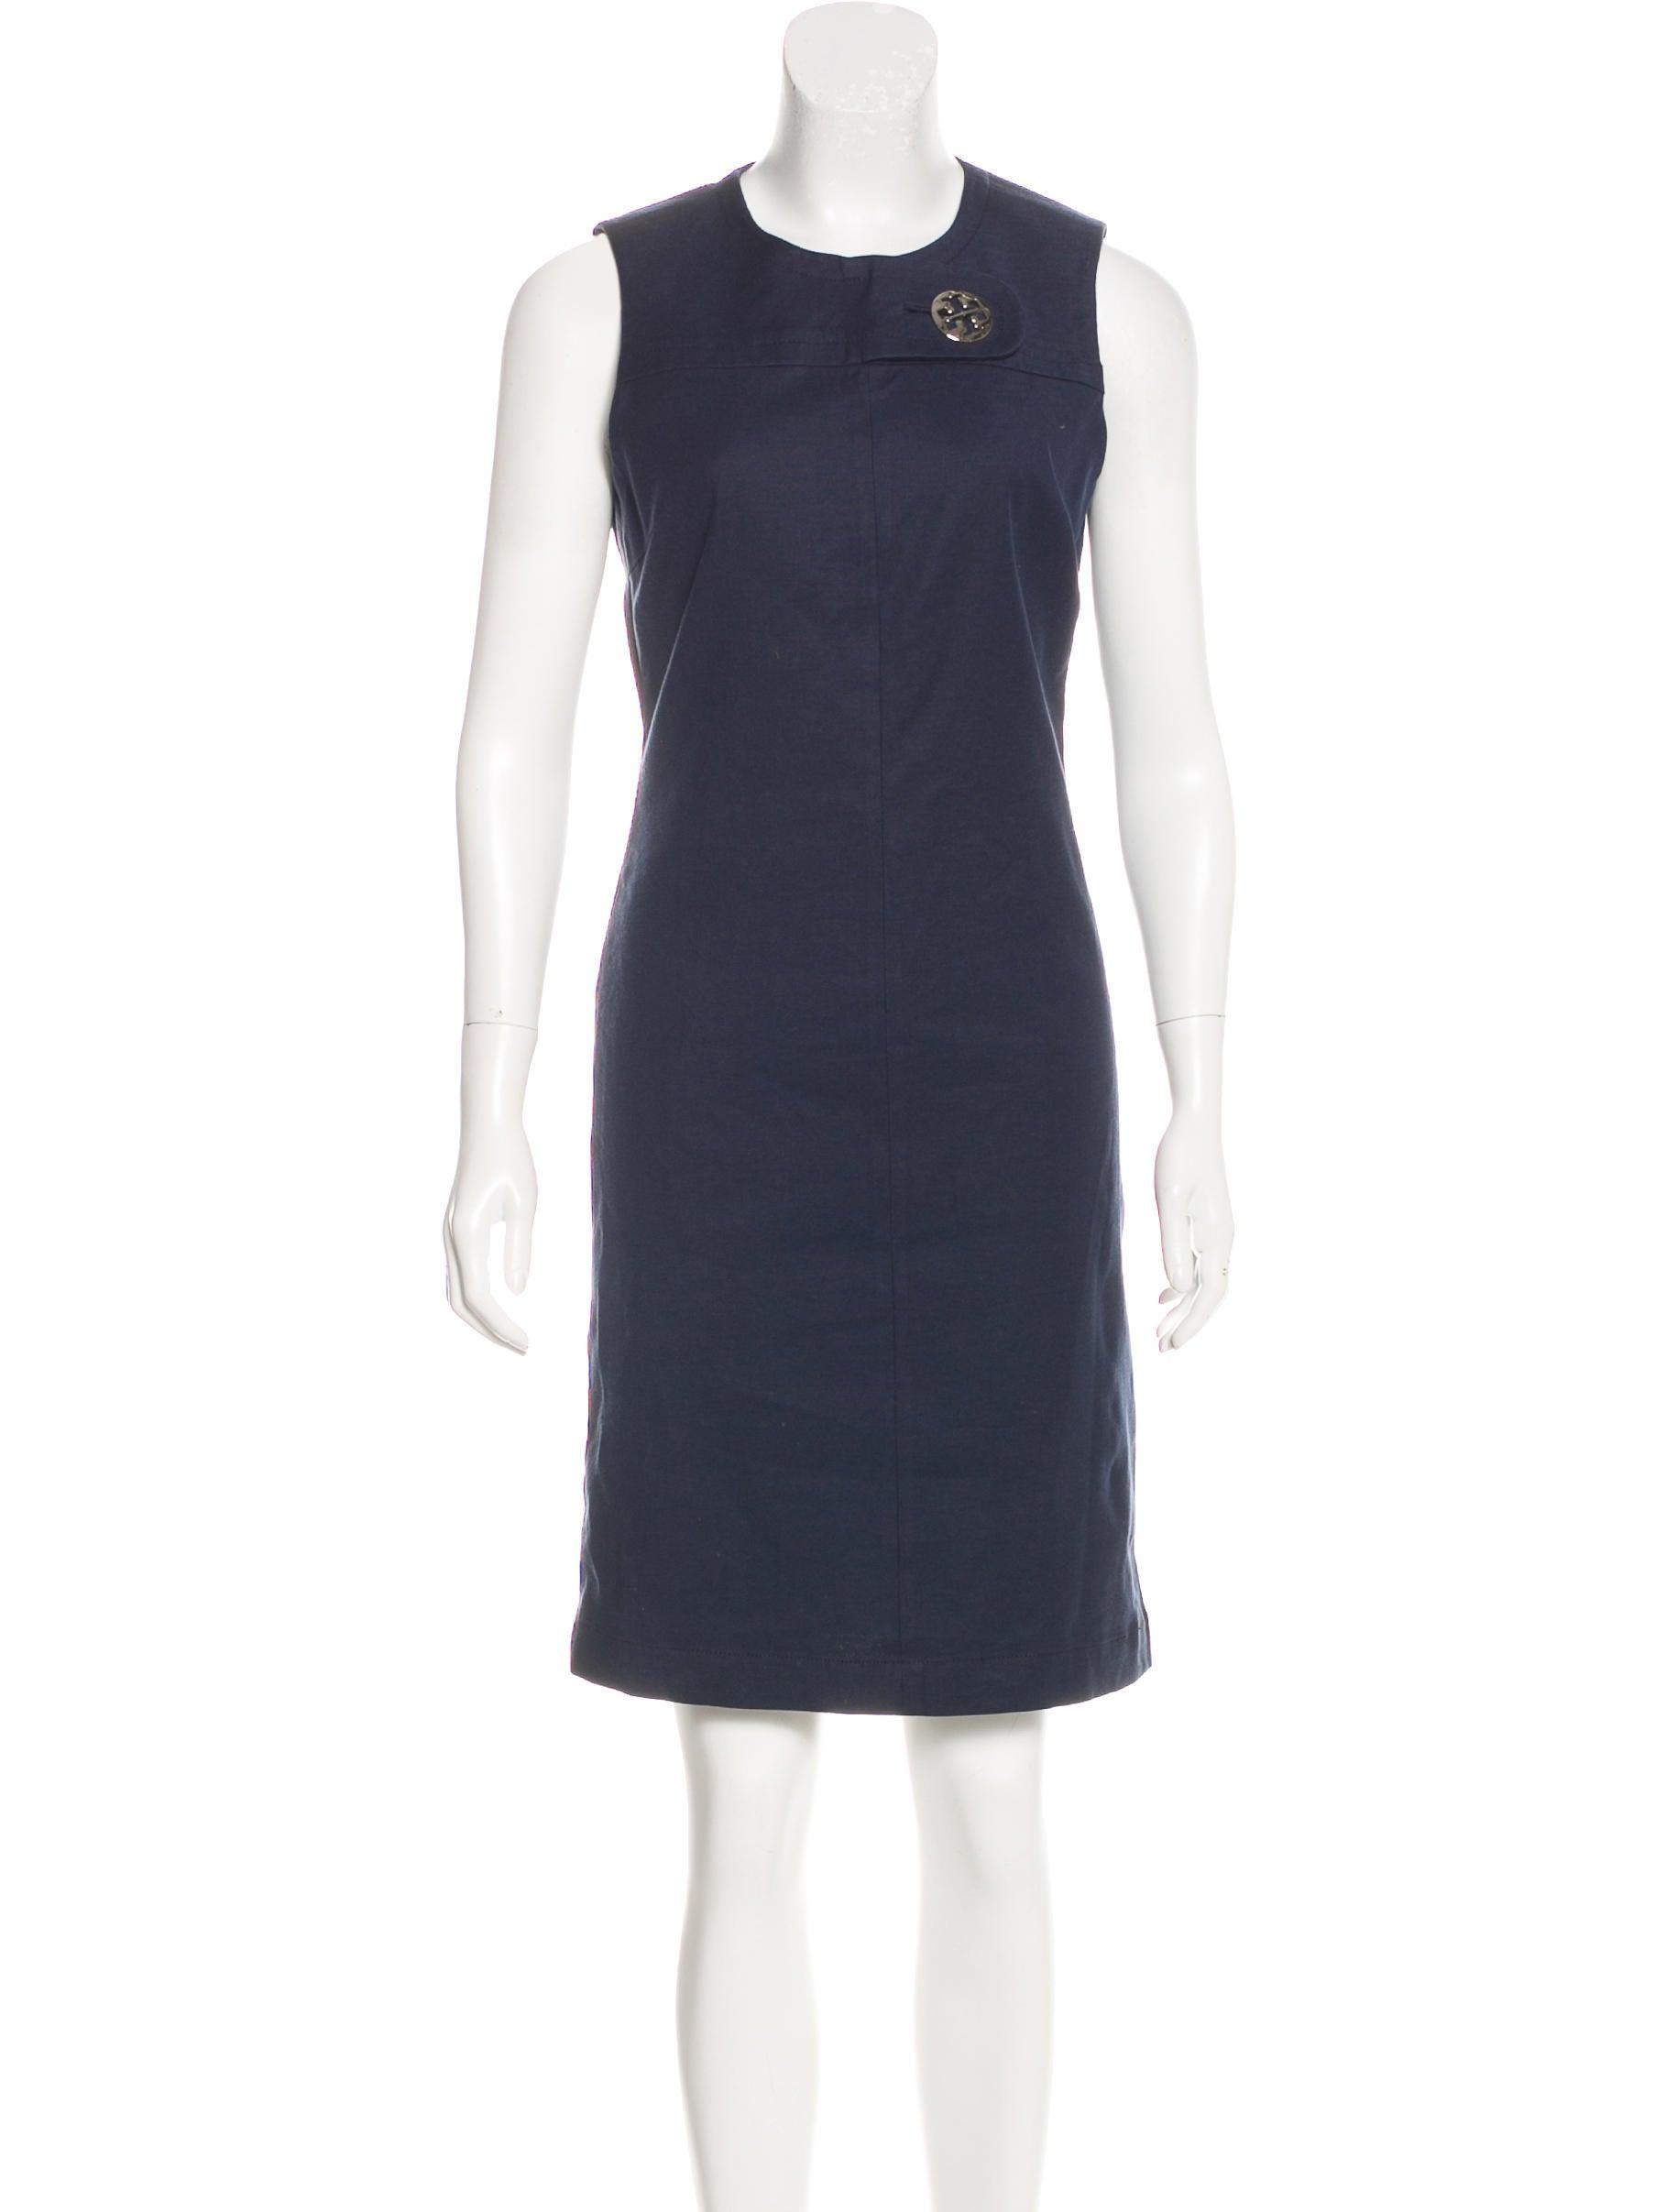 eae951ad044 Women · Clothing  Tory Burch Linen Blend Sheath Dress. Linen Blend Sheath  Dress